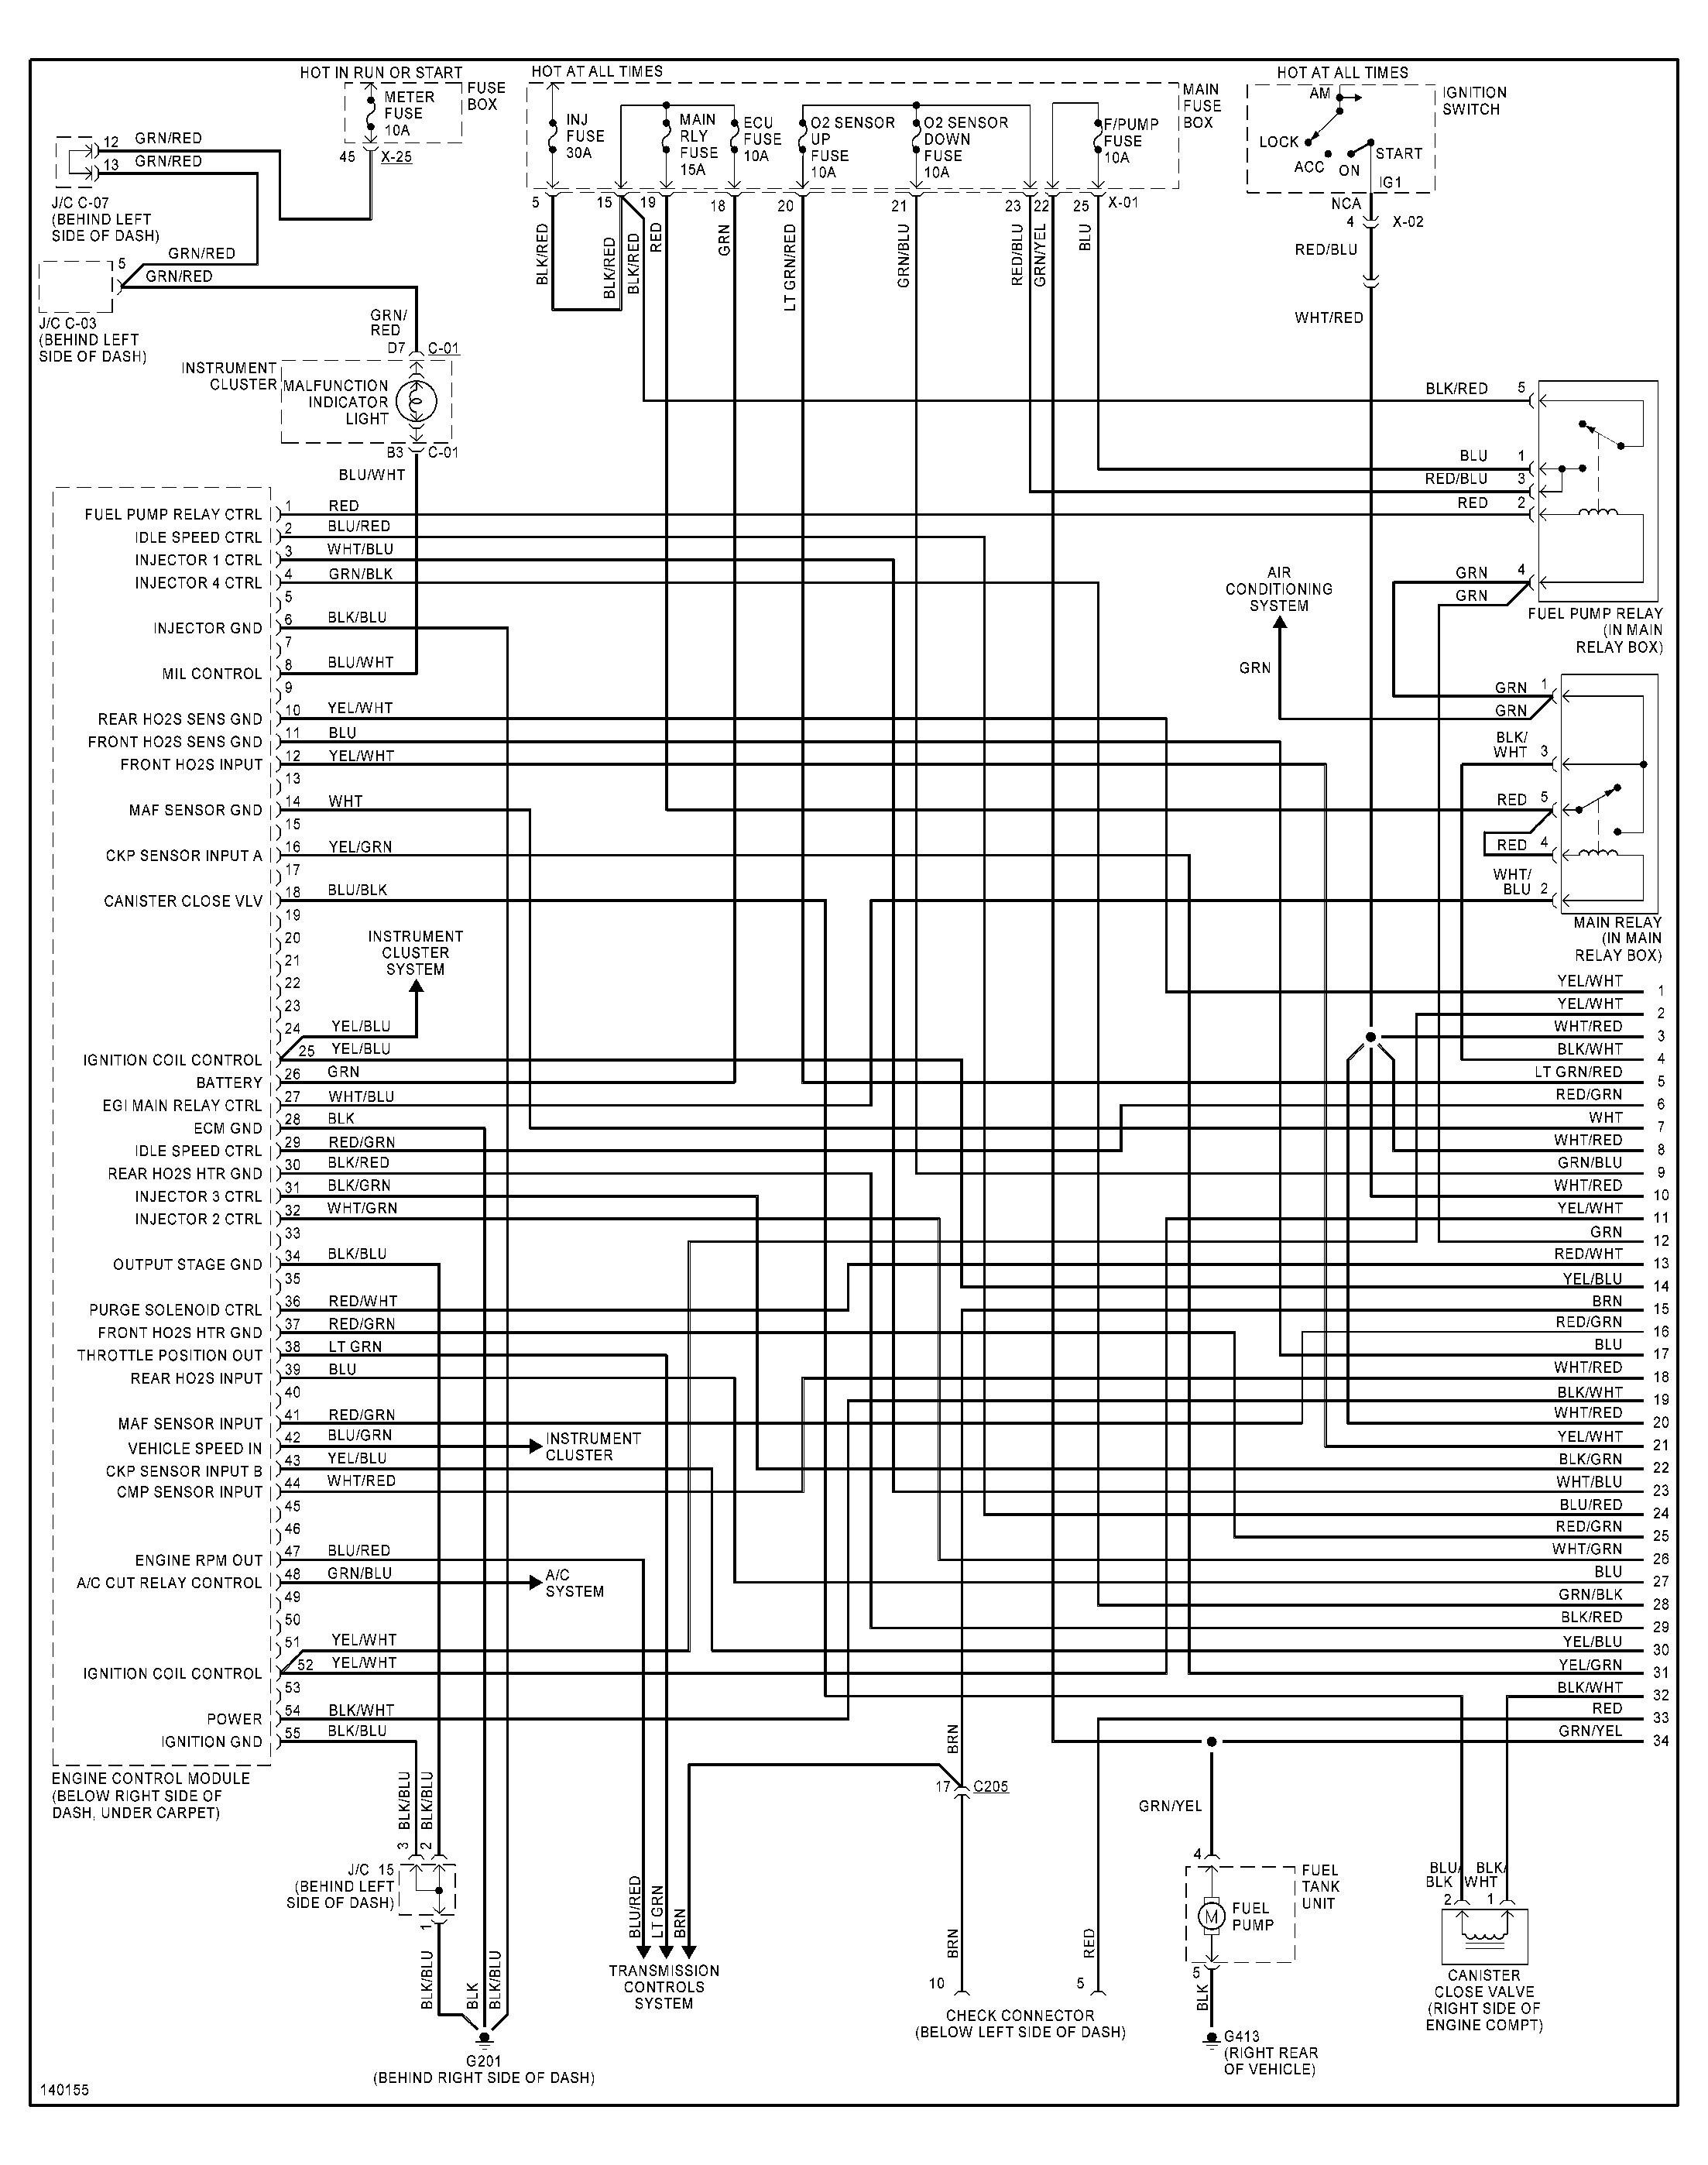 1999 kia sephia engine diagram 1998 nissan maxima radio